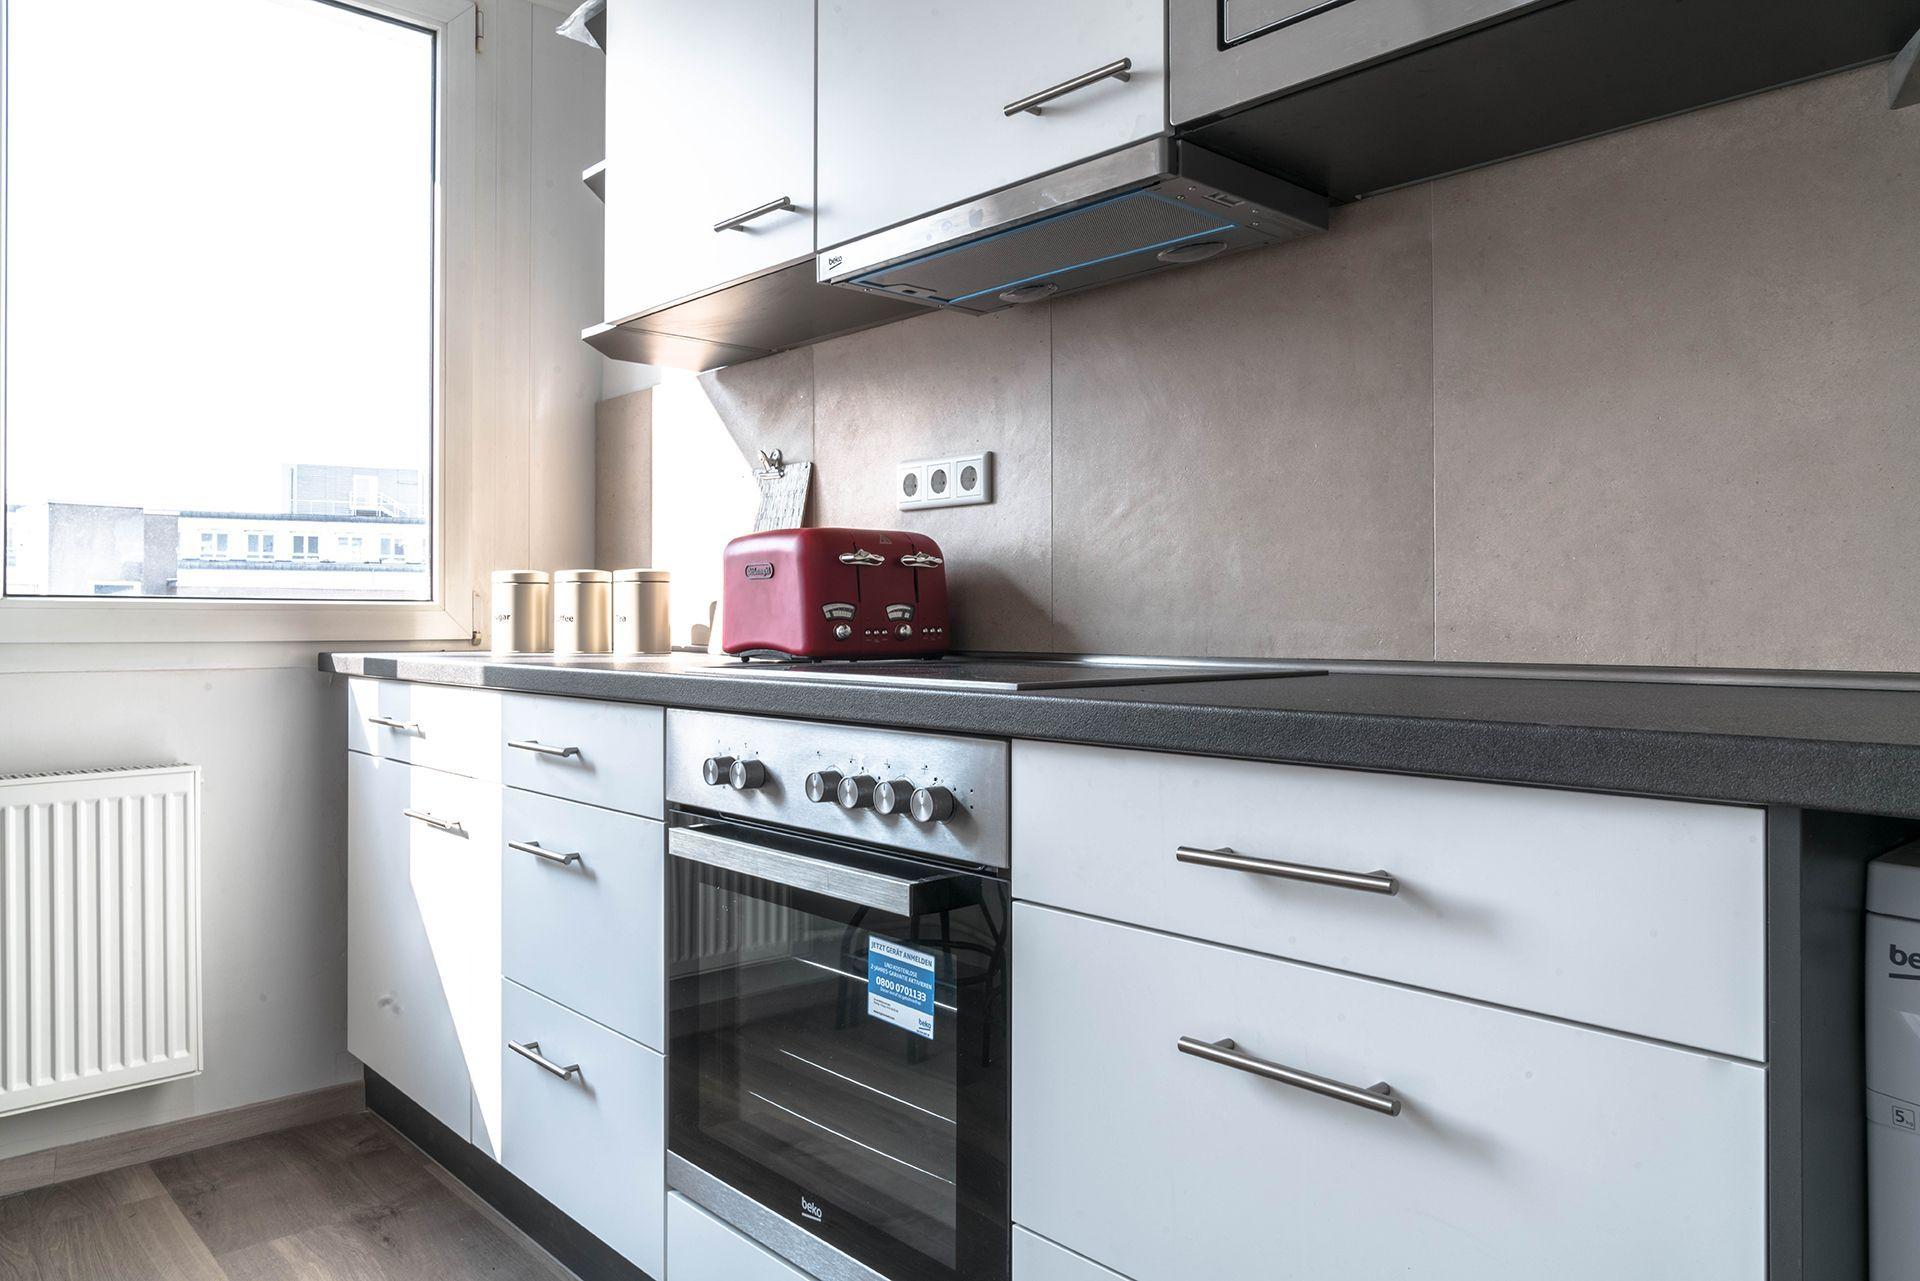 Studio apartment to rent in Berlin BILE-B104-3041-0